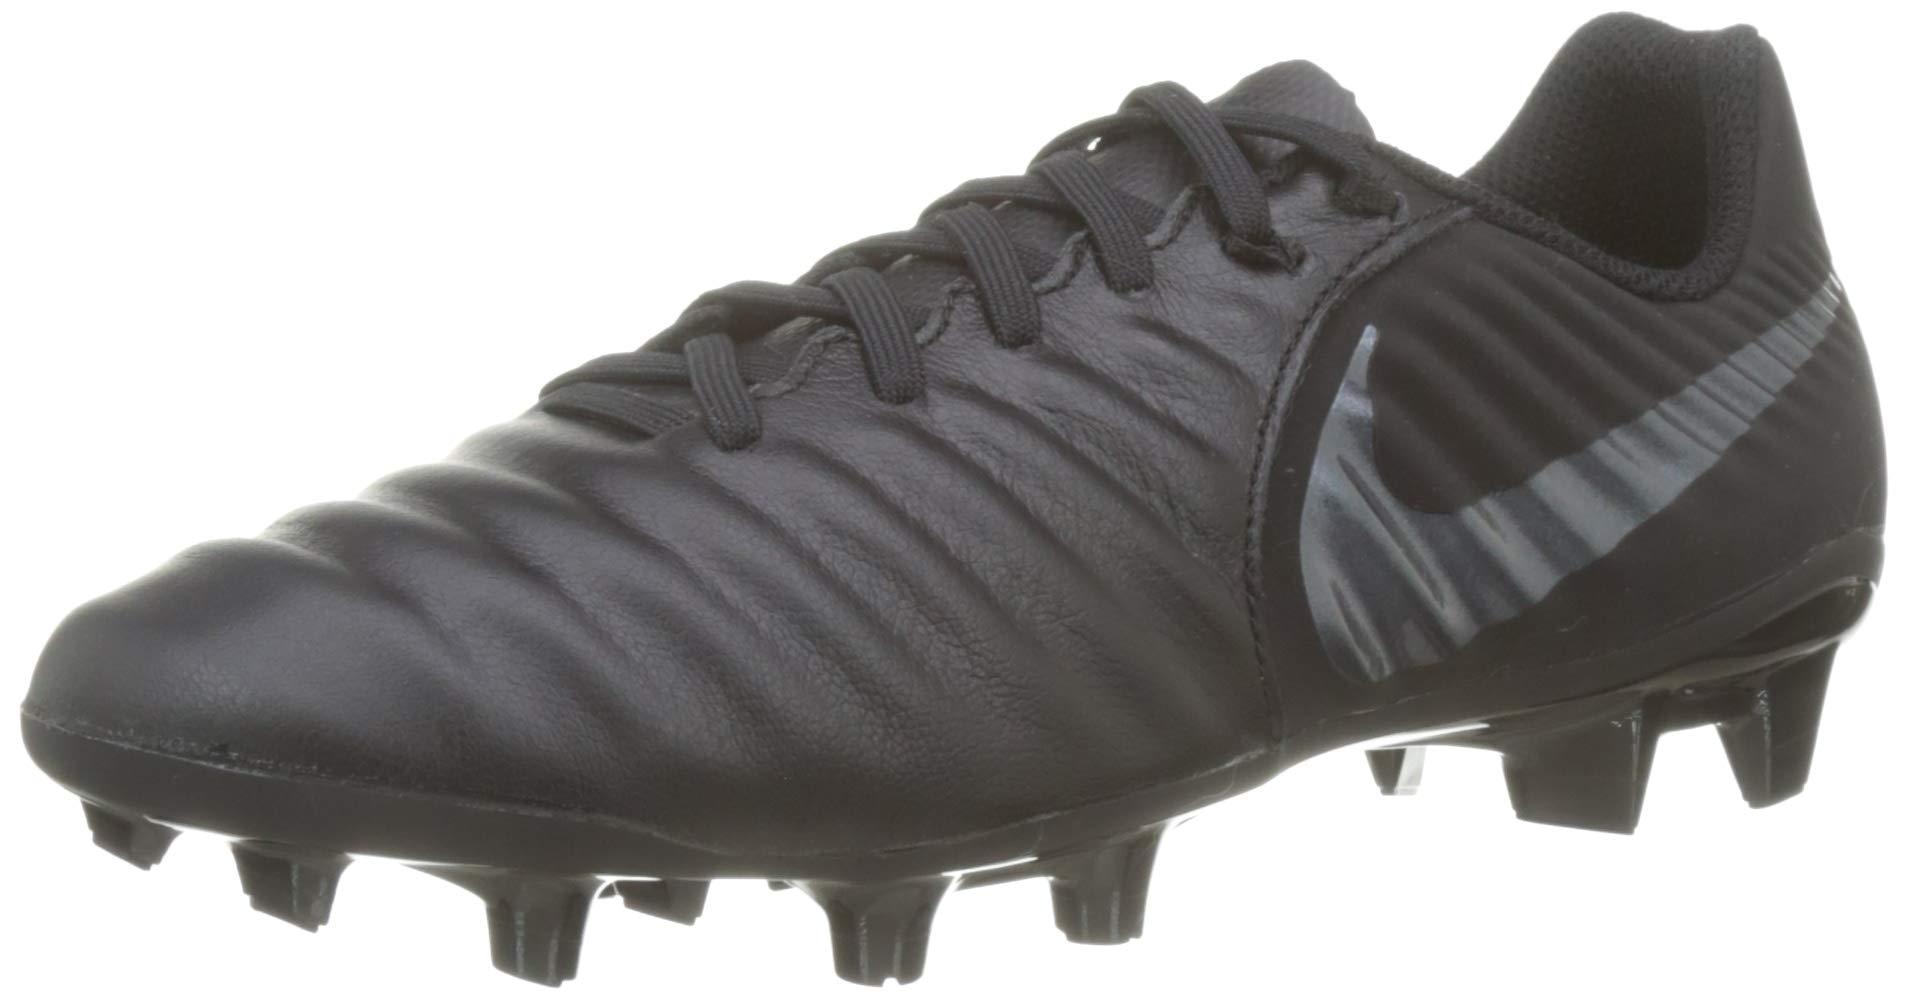 buy popular e641c 7c2aa Nike Tiempo Legend 7 Academy FG Soccer Cleat (Black) (Men's 10.5/Women's 12)